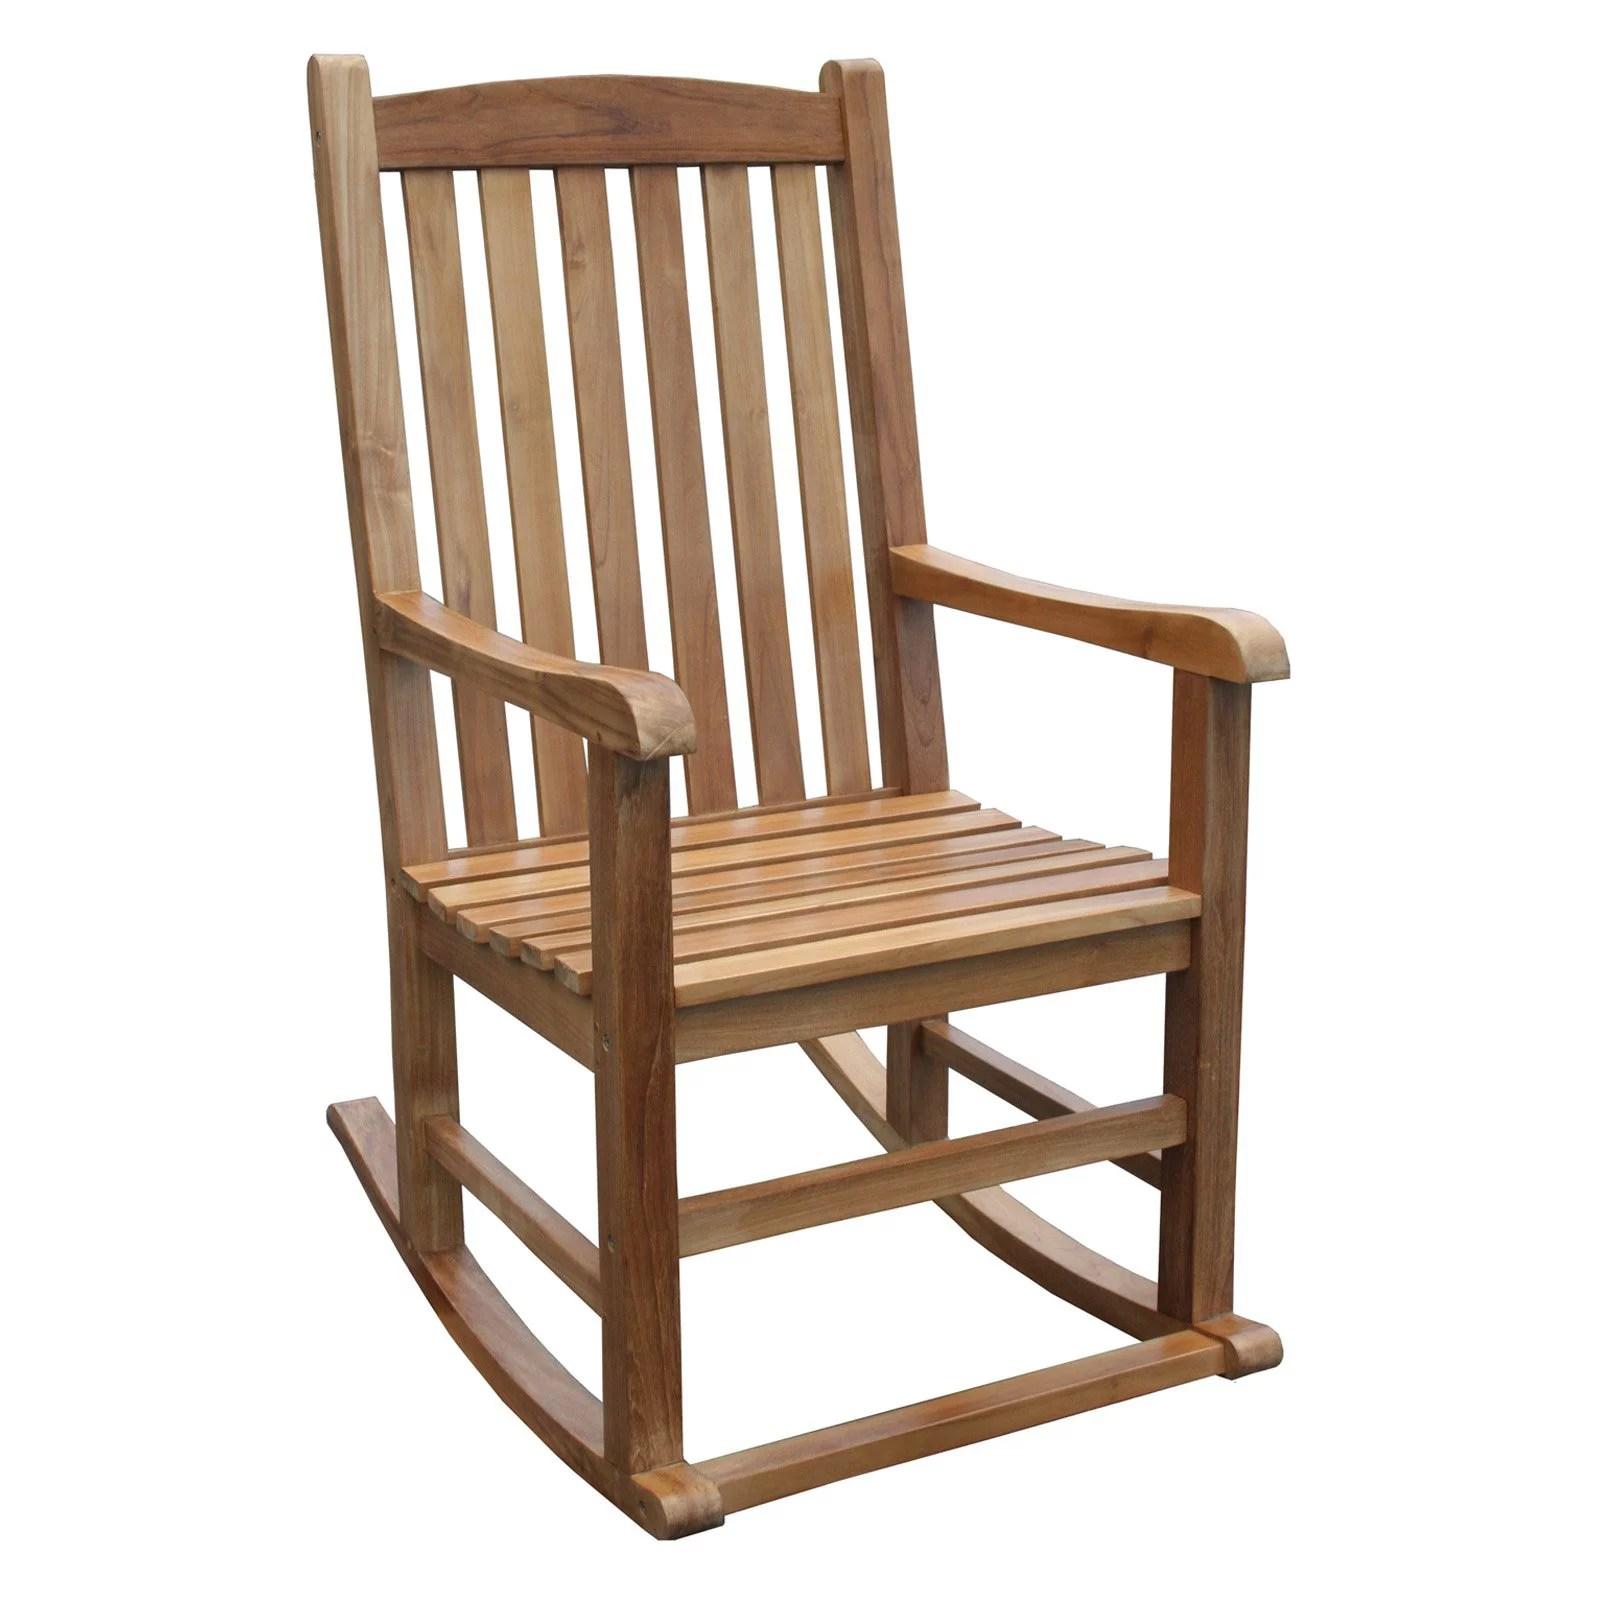 baby rocking chair walmart amazon lawn chairs chic teak outdoor